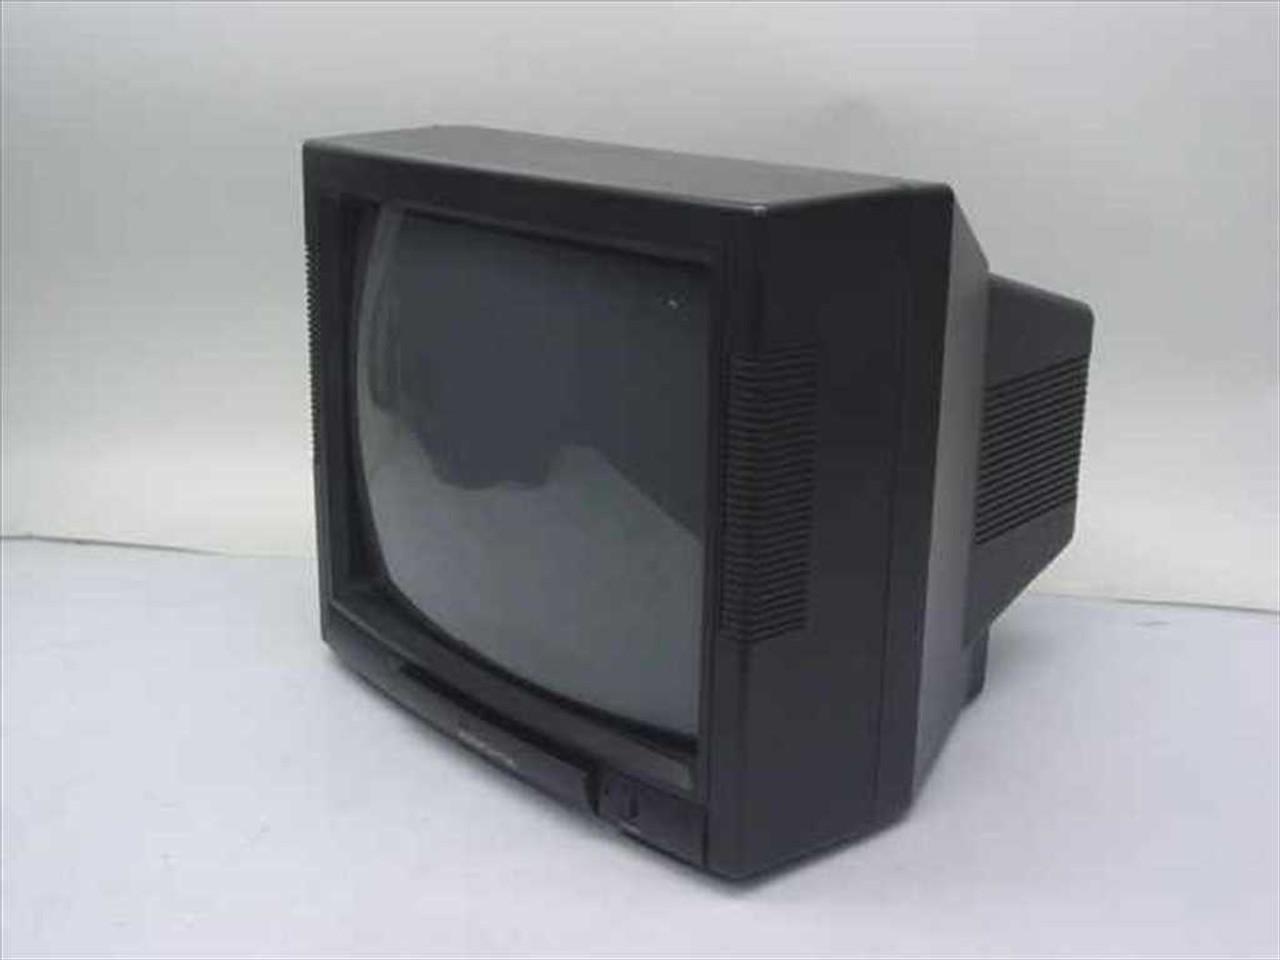 audiovox avt 1475 13 color tv monitor dc powered  [ 1024 x 768 Pixel ]